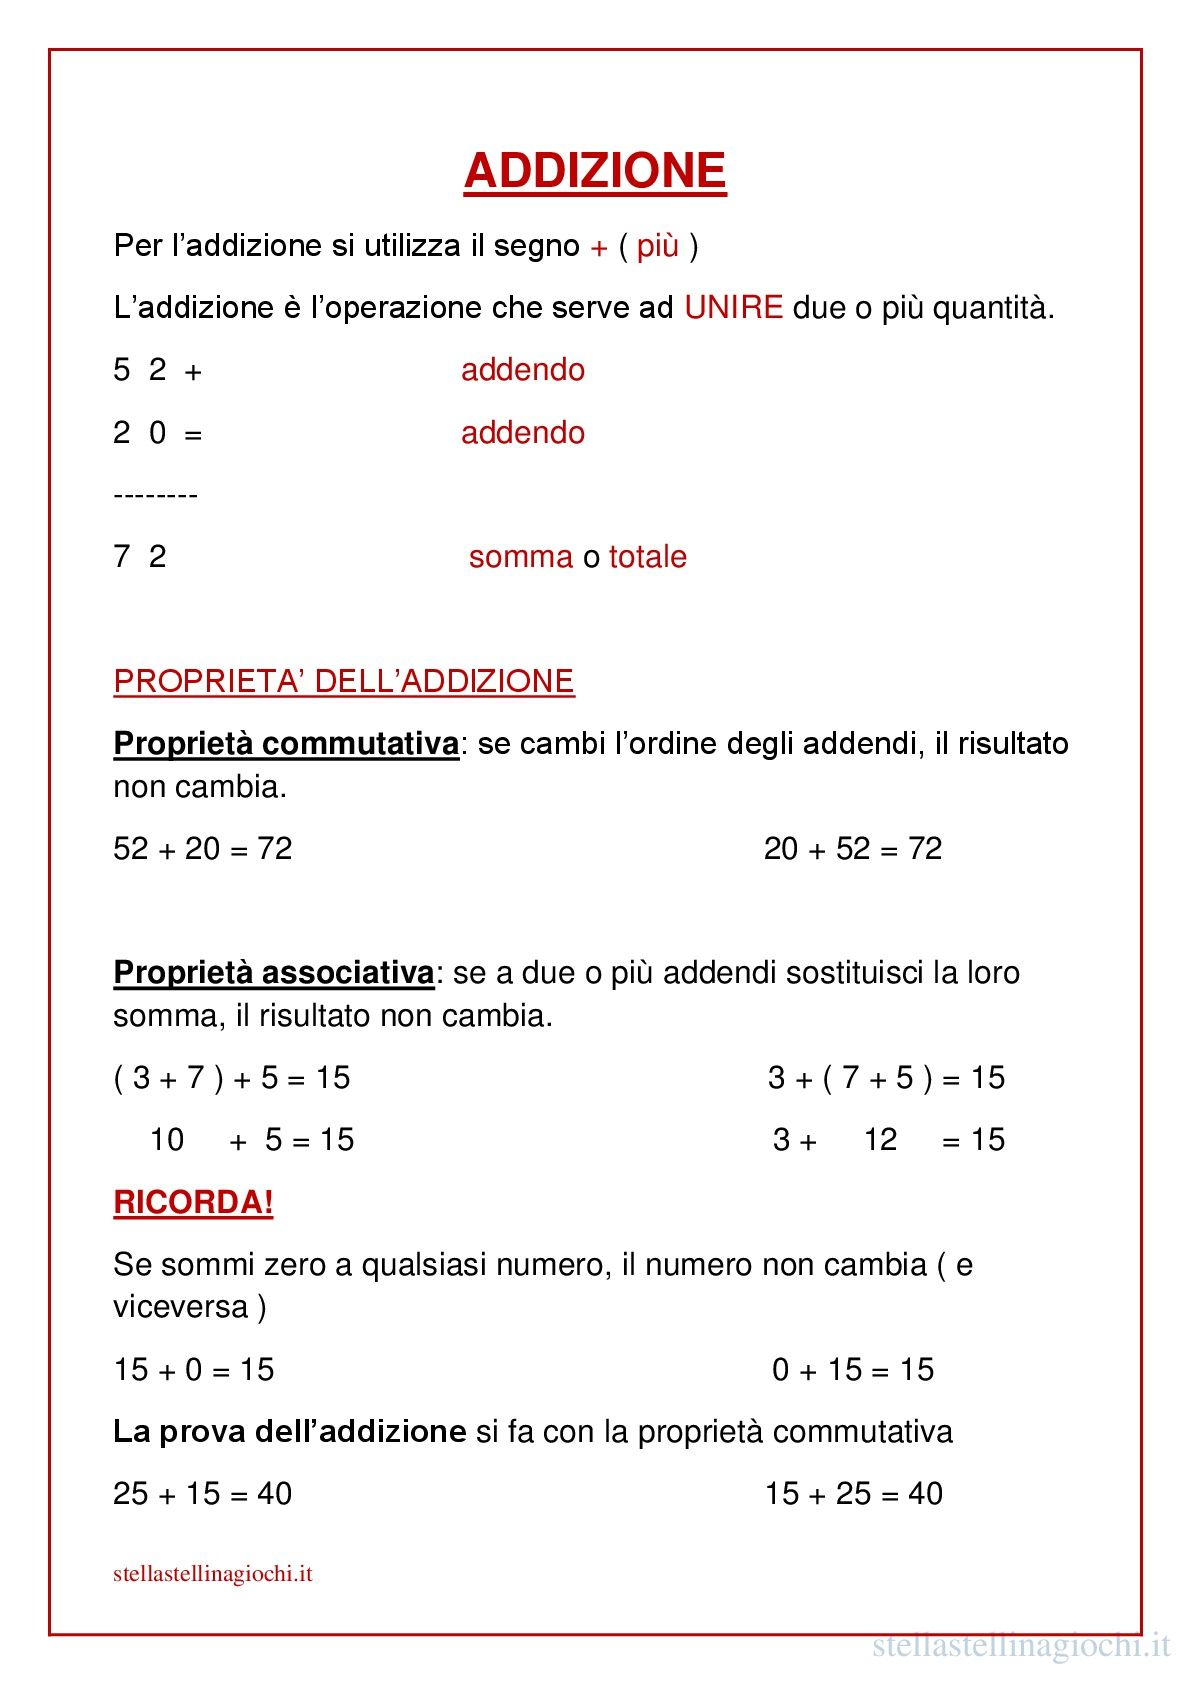 Schede didattiche di matematica. L'addizione. Sul blog ...